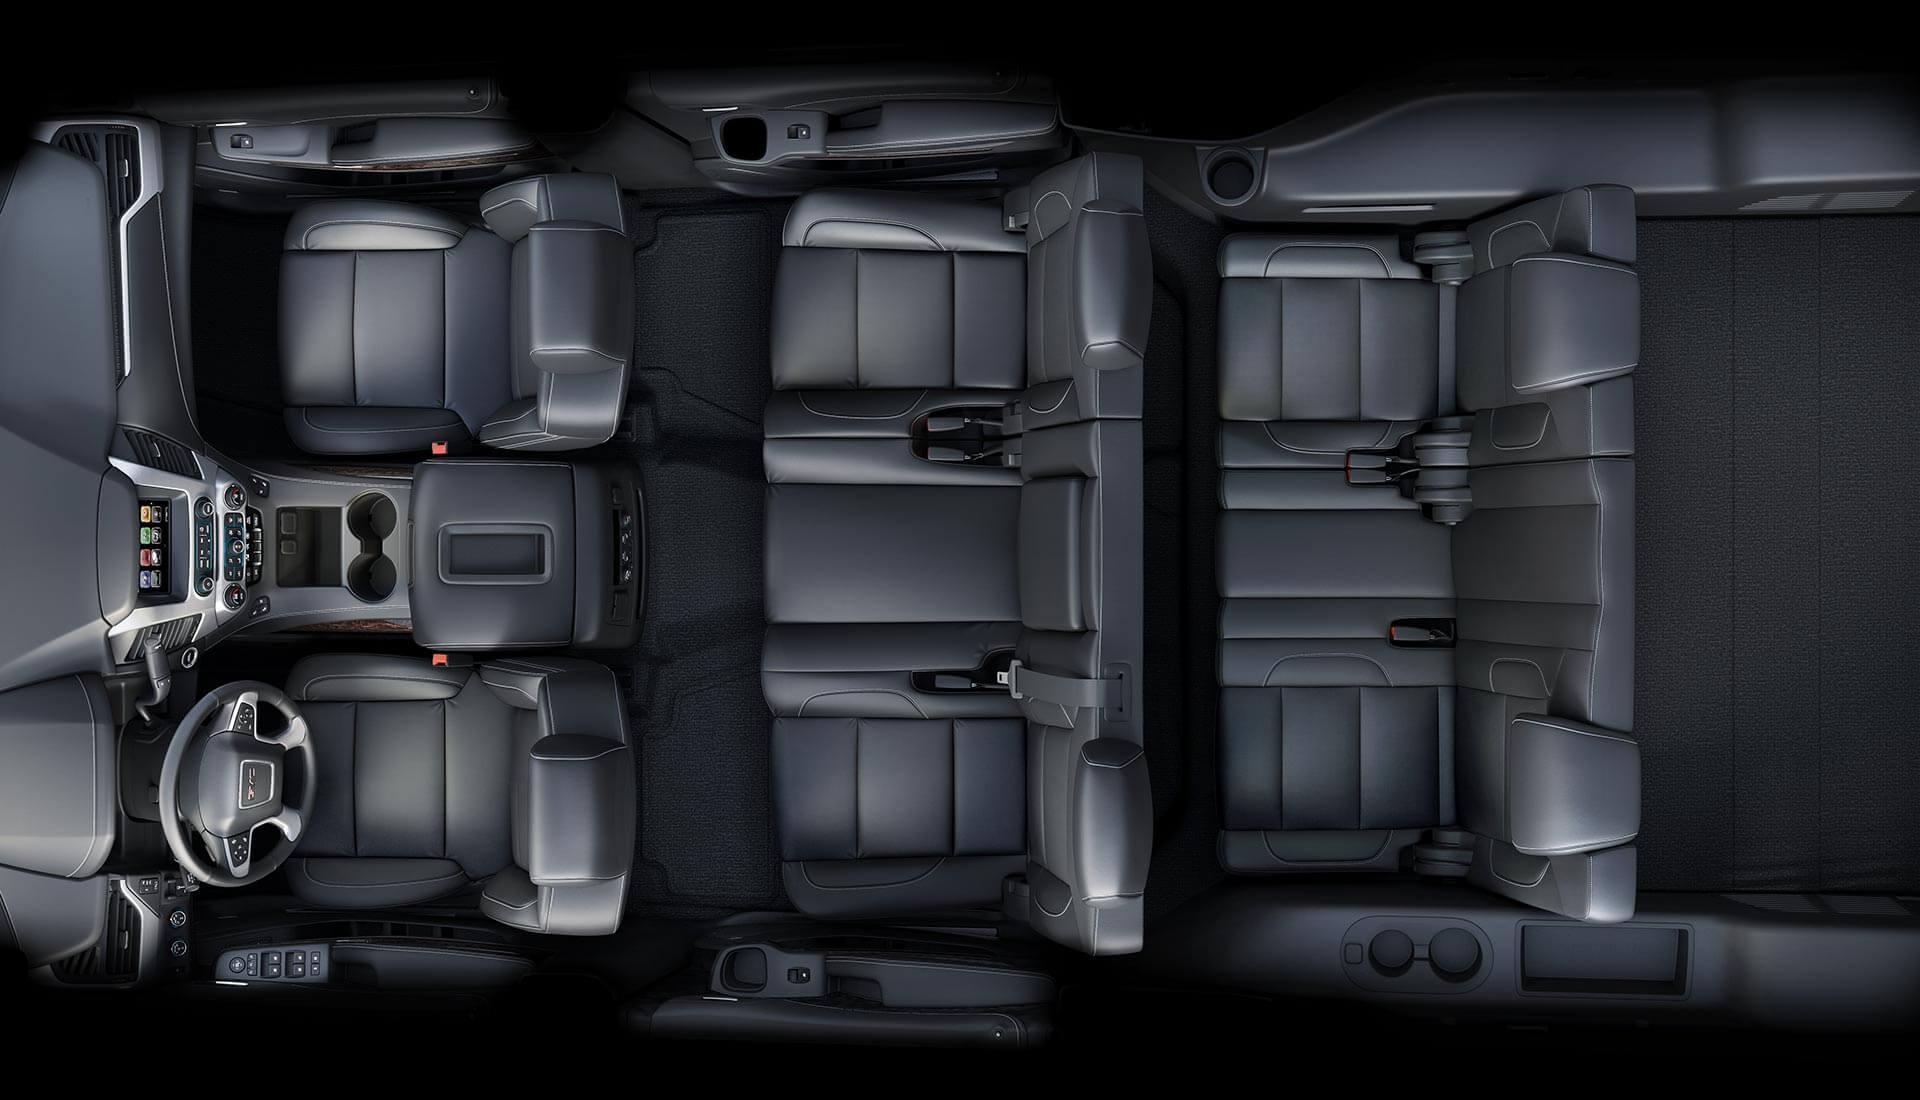 2018 Gmc Yukon Xl For Sale In California Socal Buick Gmc